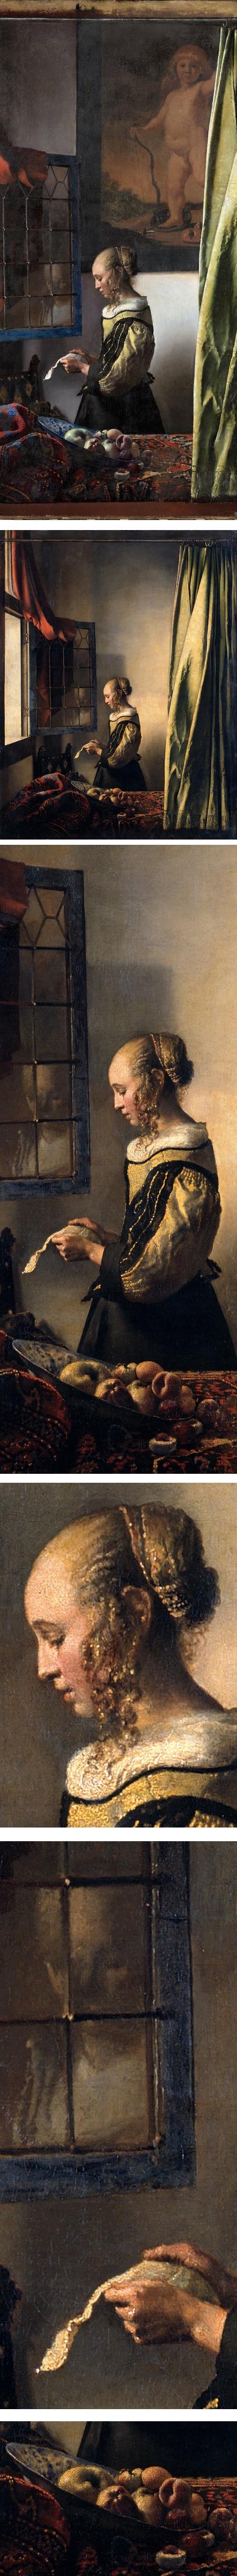 Vermeer restoration unveiled with revealed Cupid